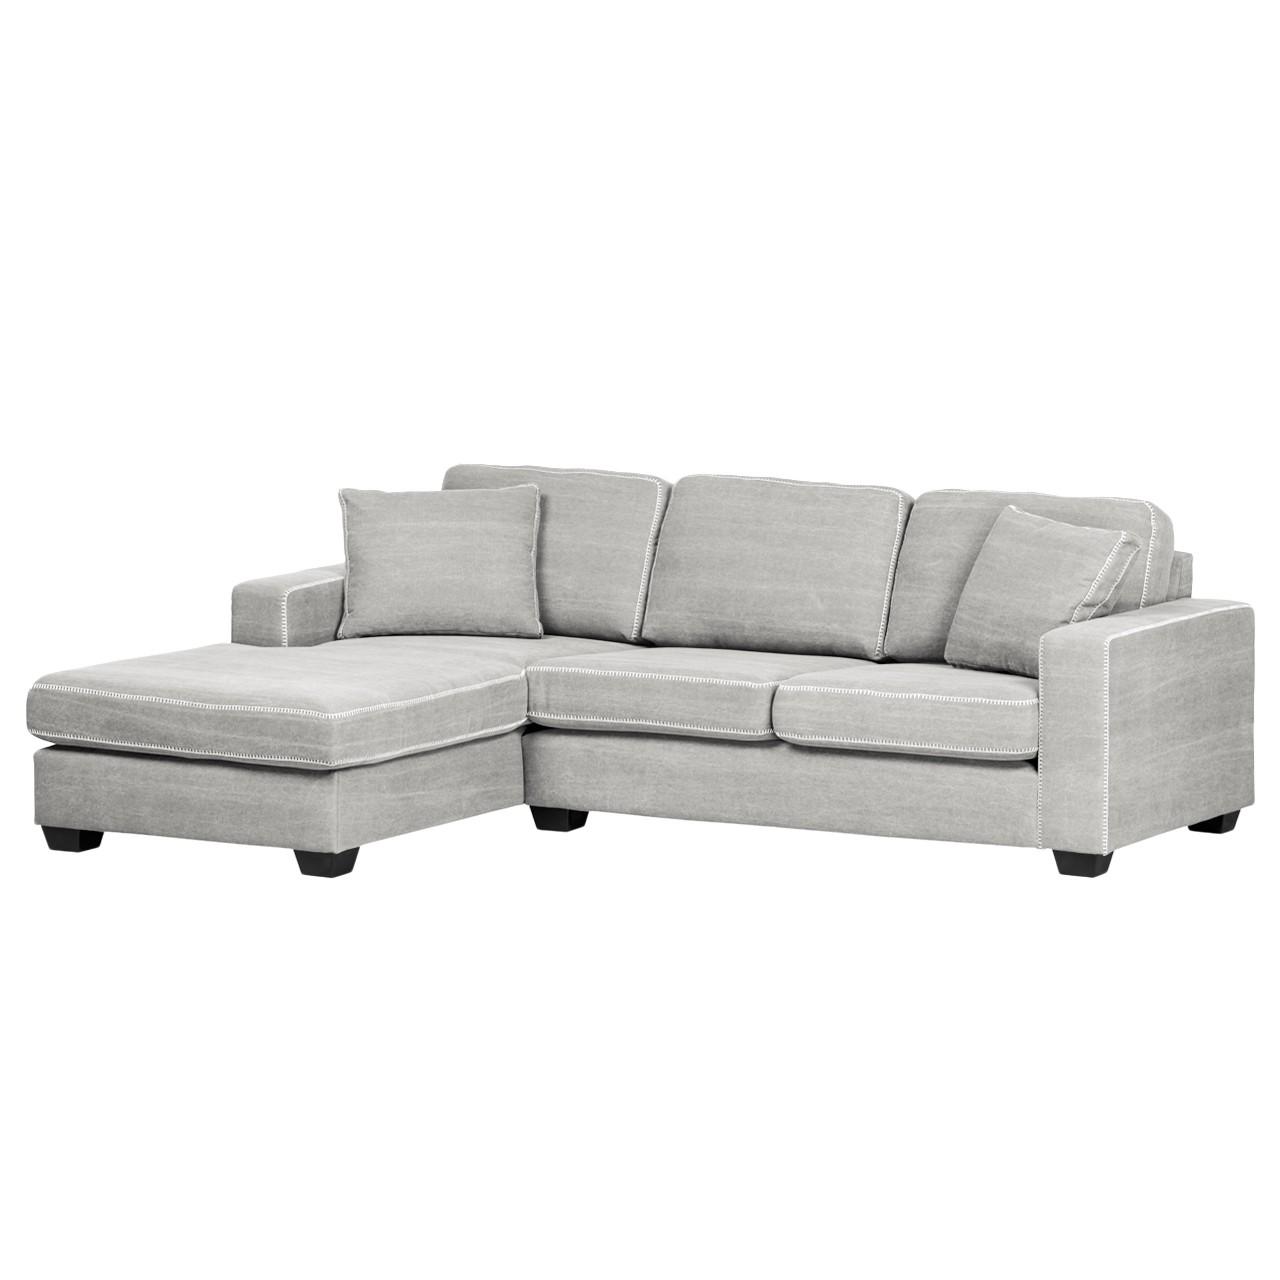 Sandgrau sofa interessante ideen f r die for Ecksofa nelson